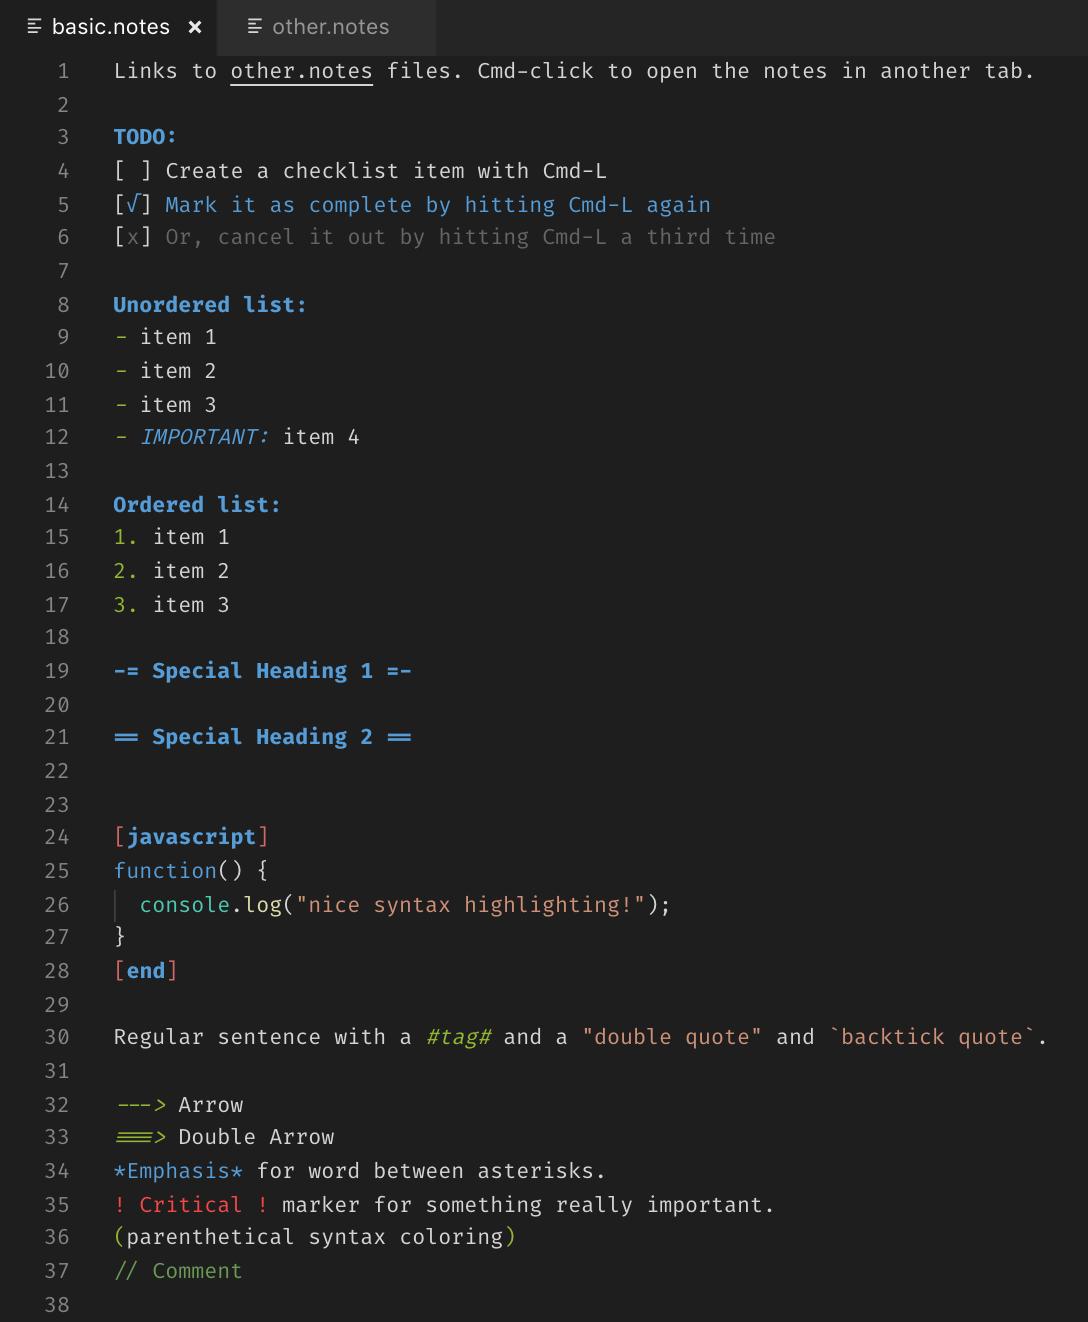 vscode notes sample